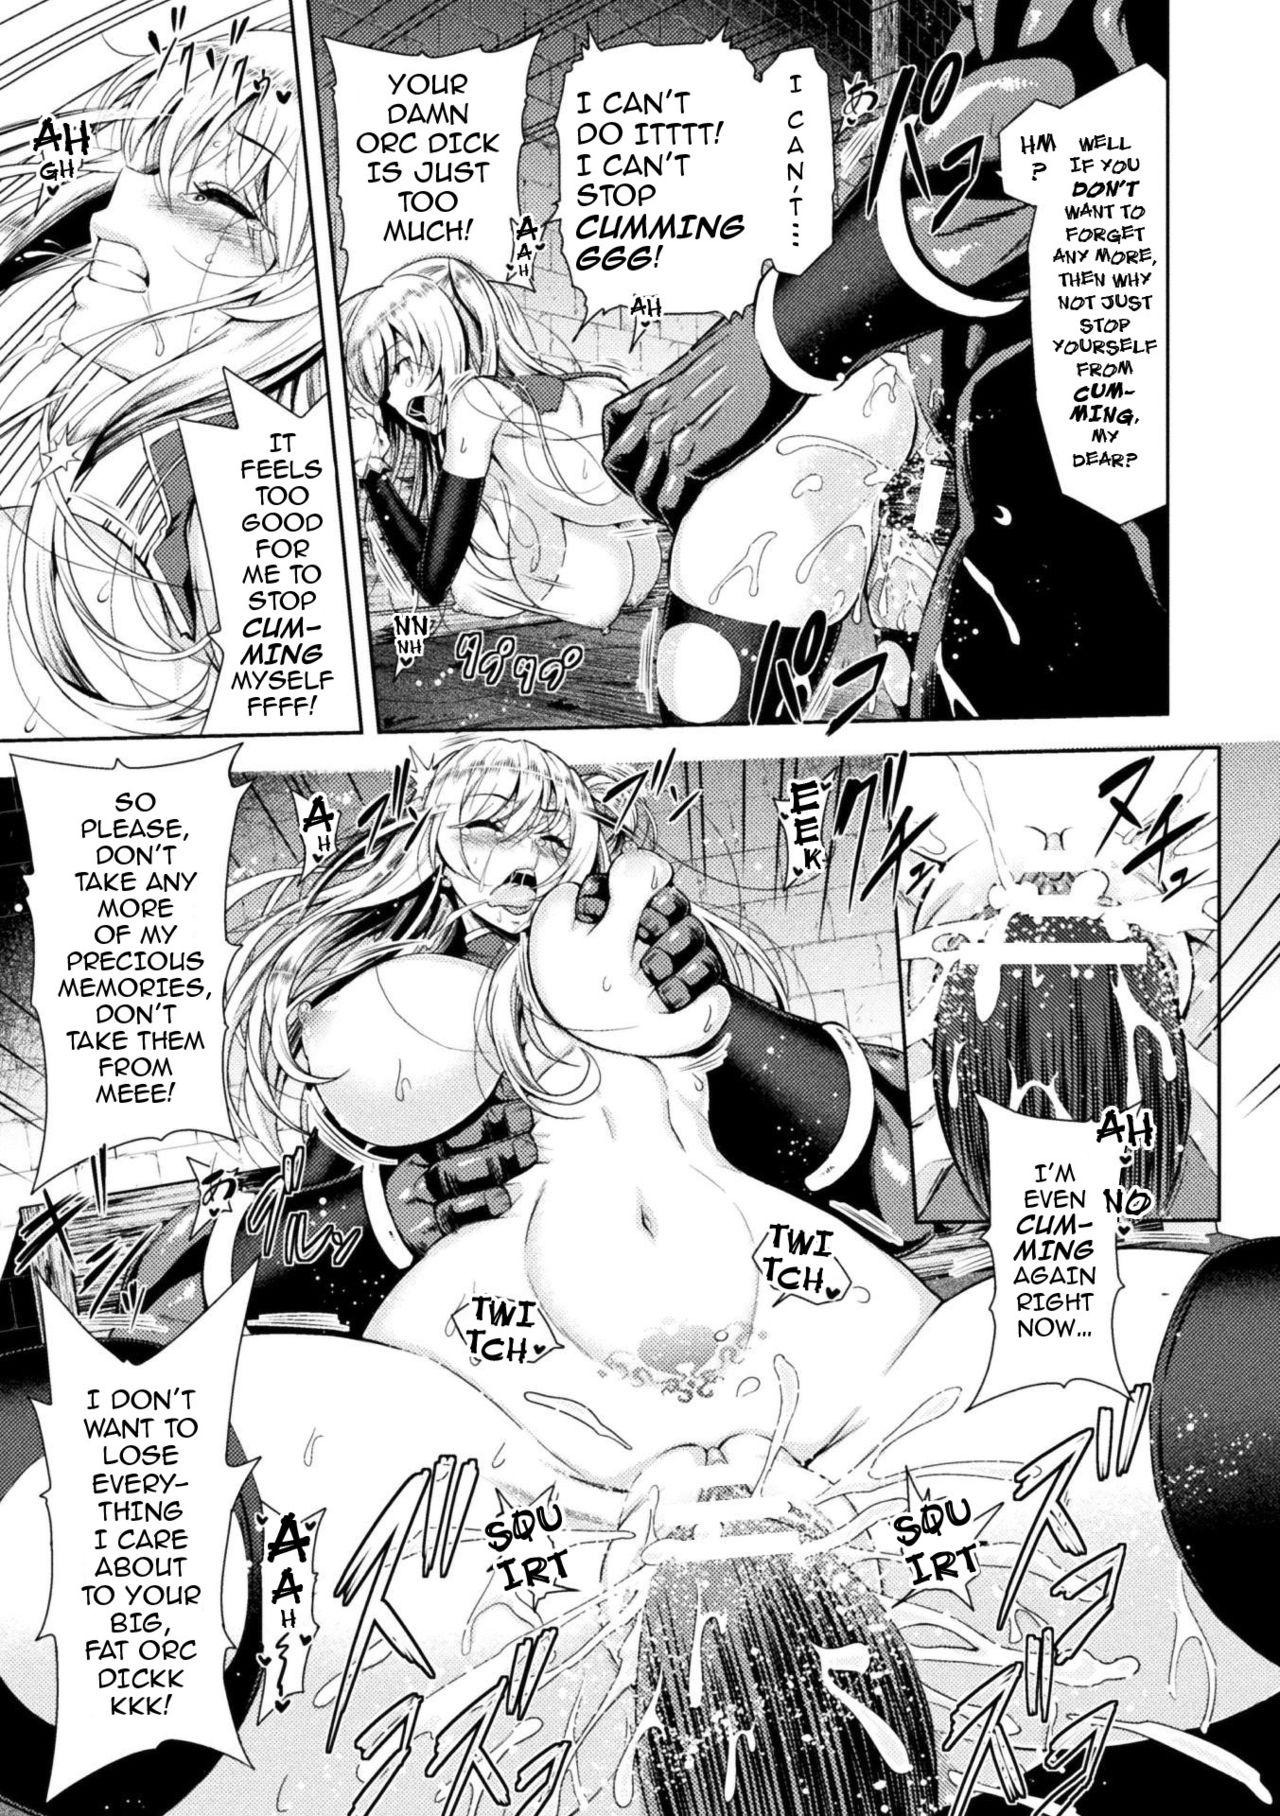 [Yamada Gogogo] Erona ~Orc no Inmon ni Okasareta Onna Kishi no Matsuro~ | Erona ~The Fall of a Beautiful Knight Cursed with the Lewd Mark of an Orc~ Ch. 1-5 [English] {darknight} 45